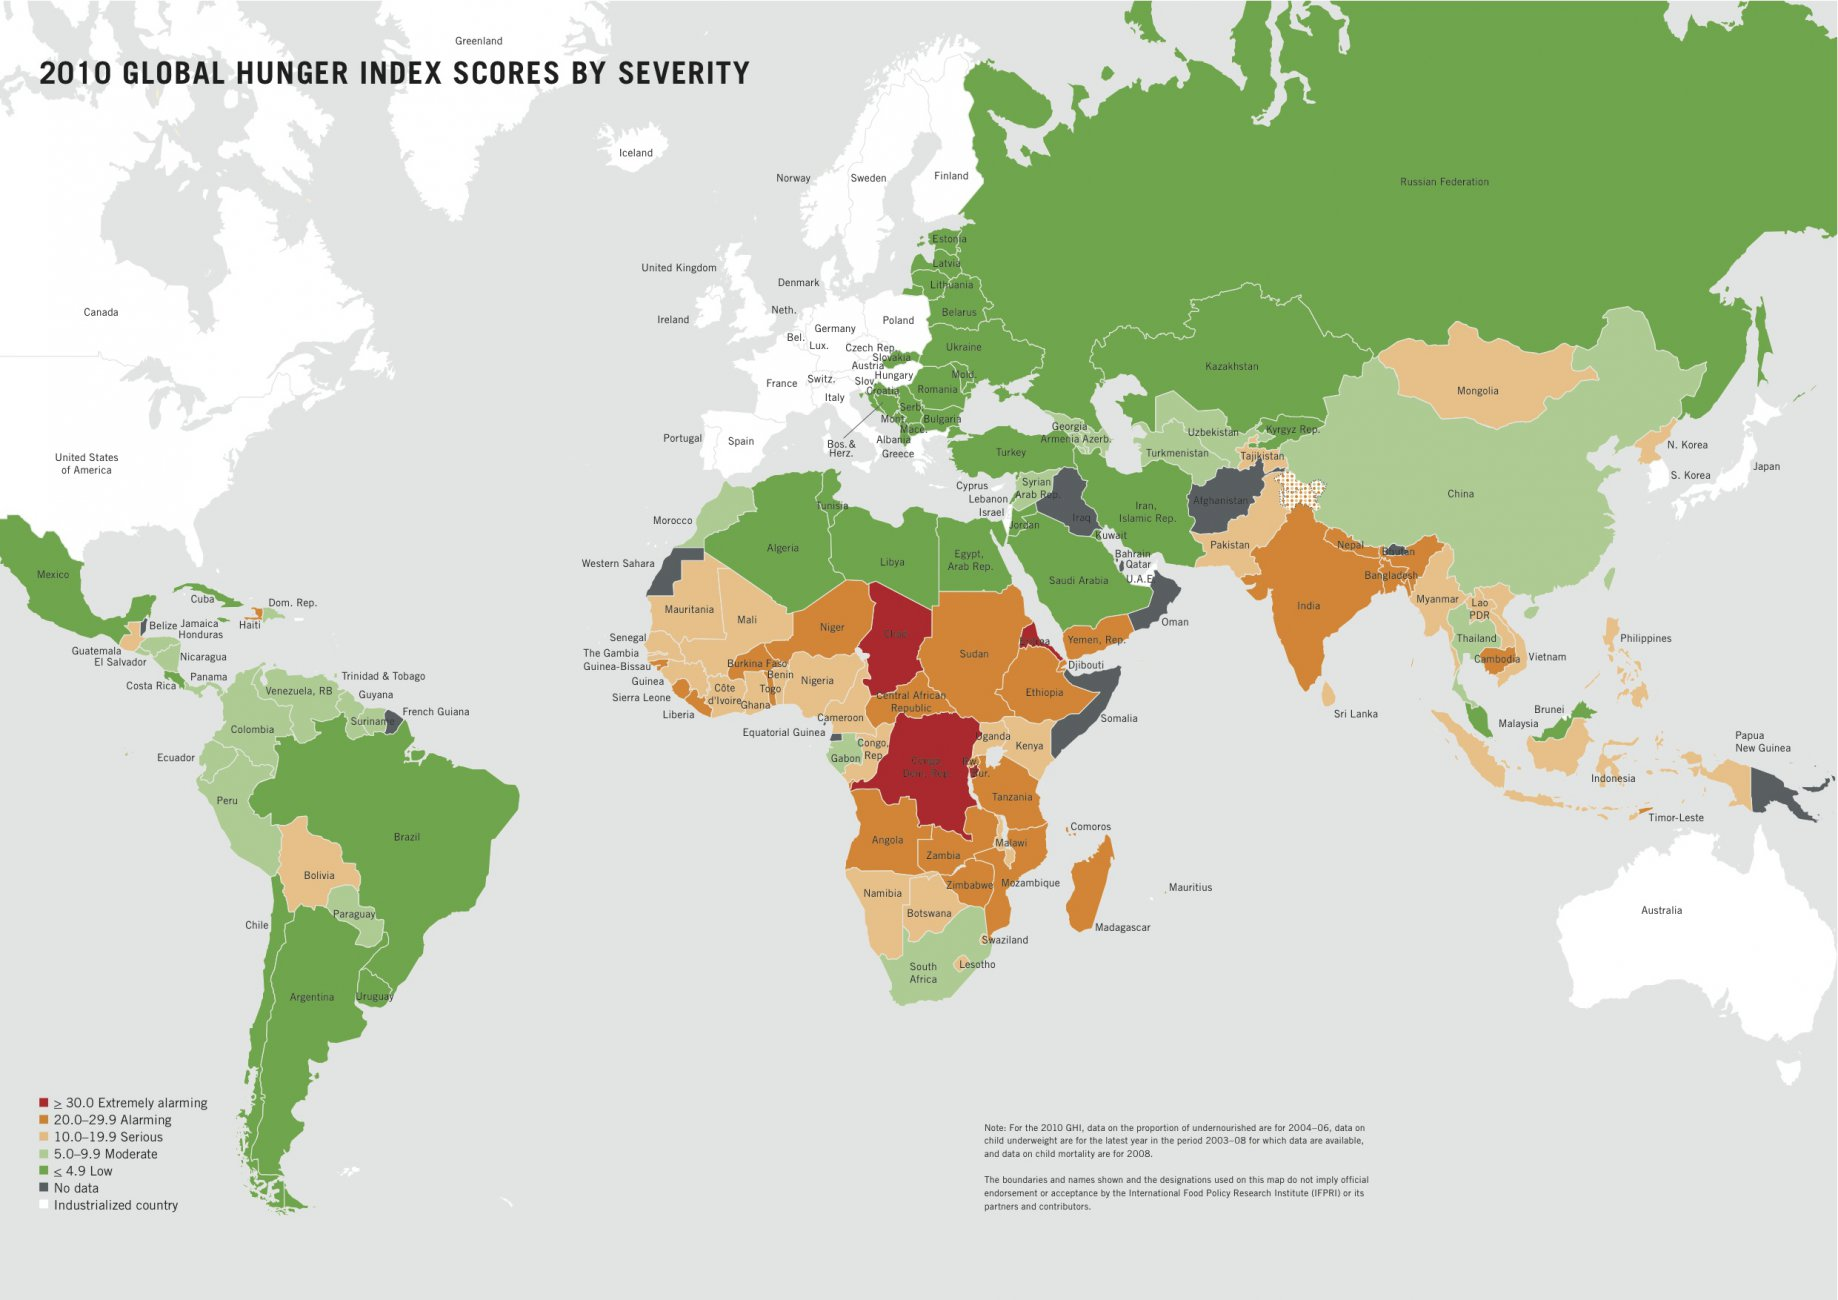 GHI2010_Severity_Map.индекс голодаjpg.jpg